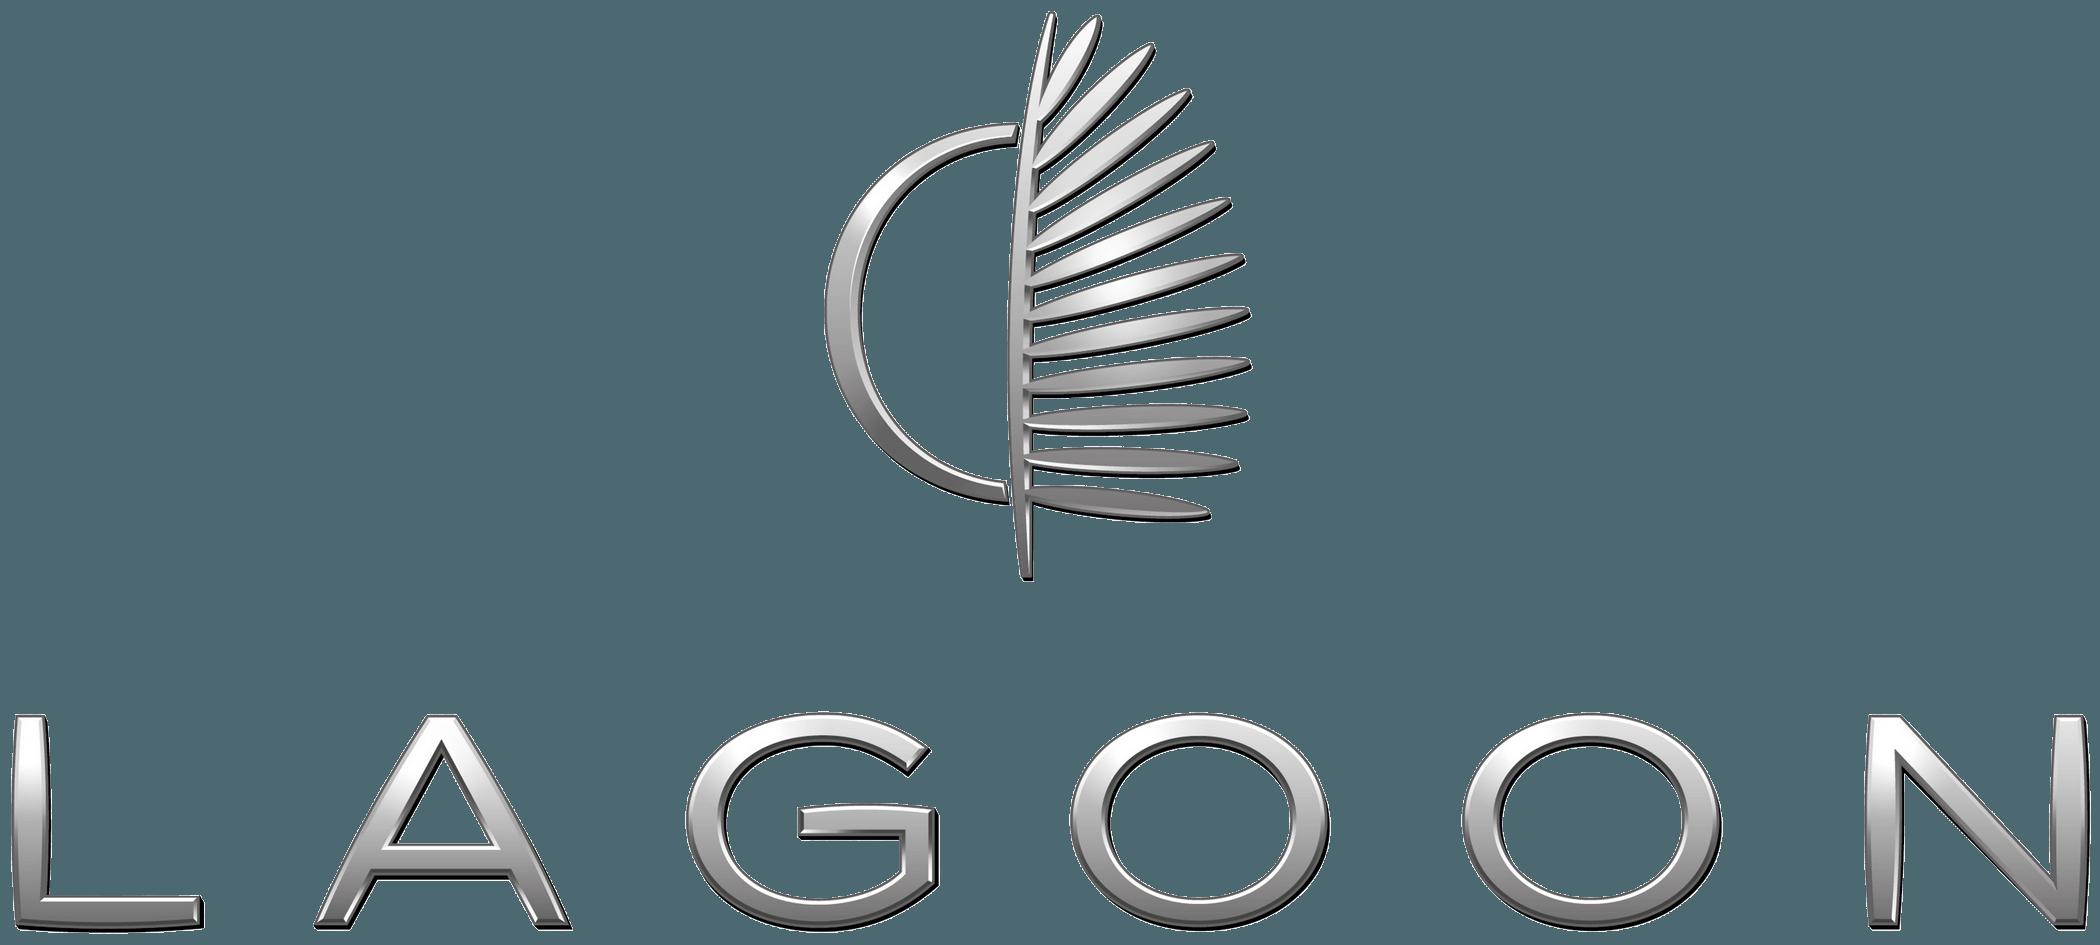 Lagoon Logo png